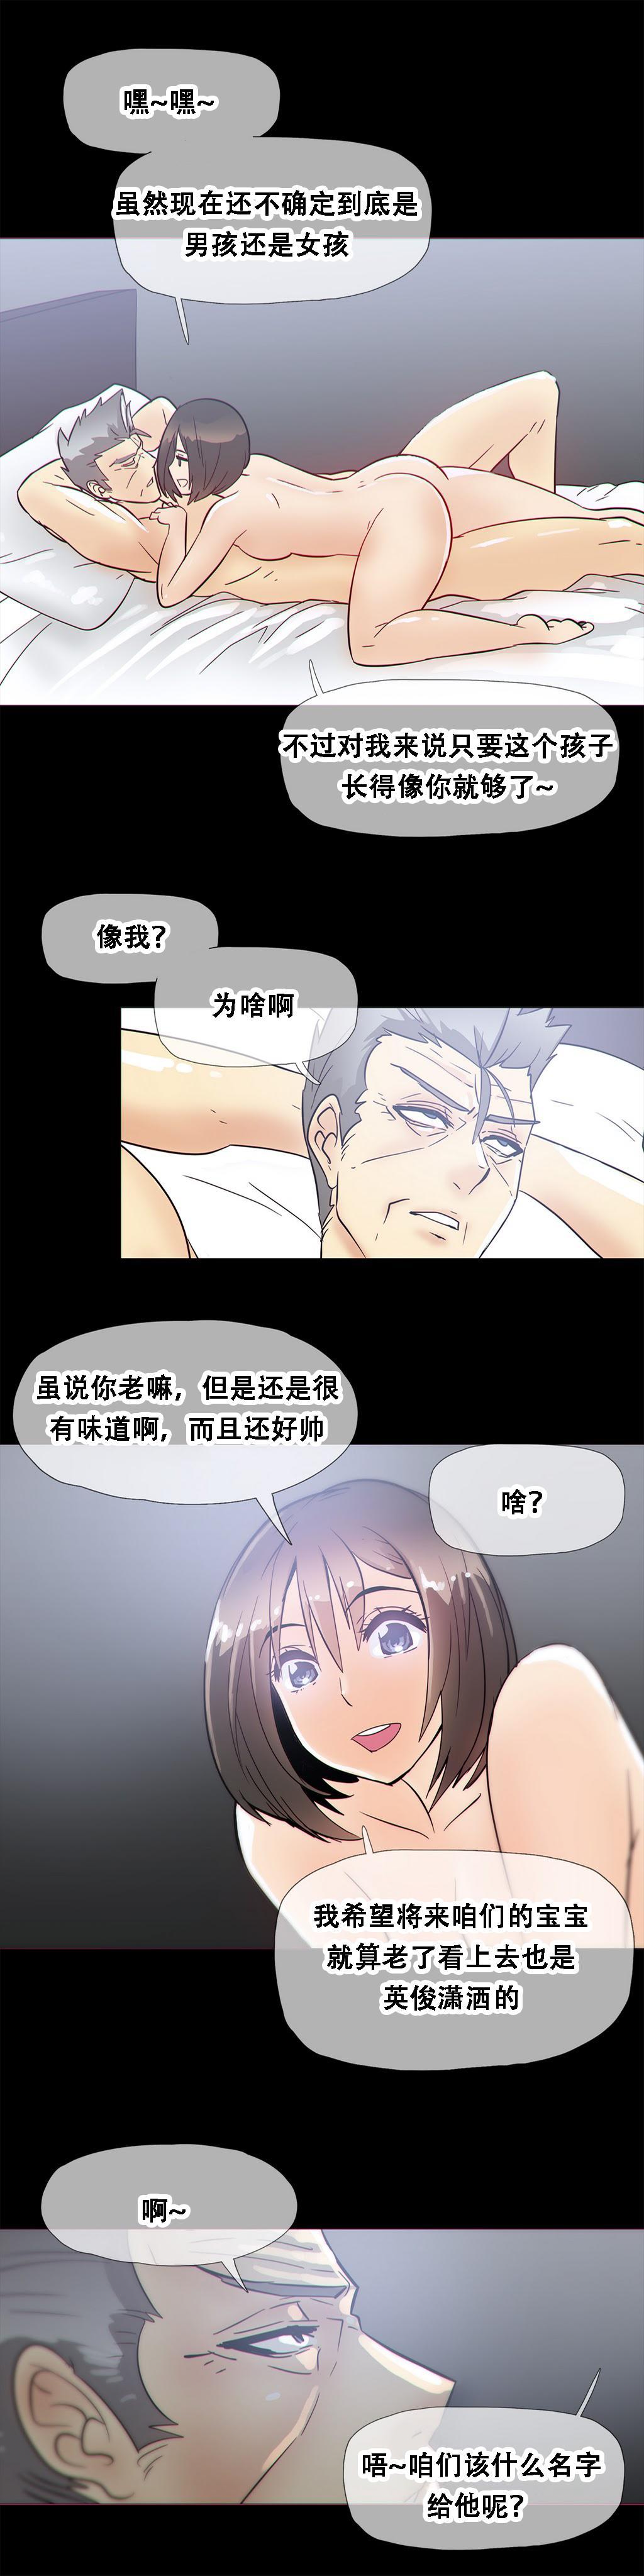 HouseHold Affairs 【卞赤鲤个人汉化】1~21话(持续更新中) 389